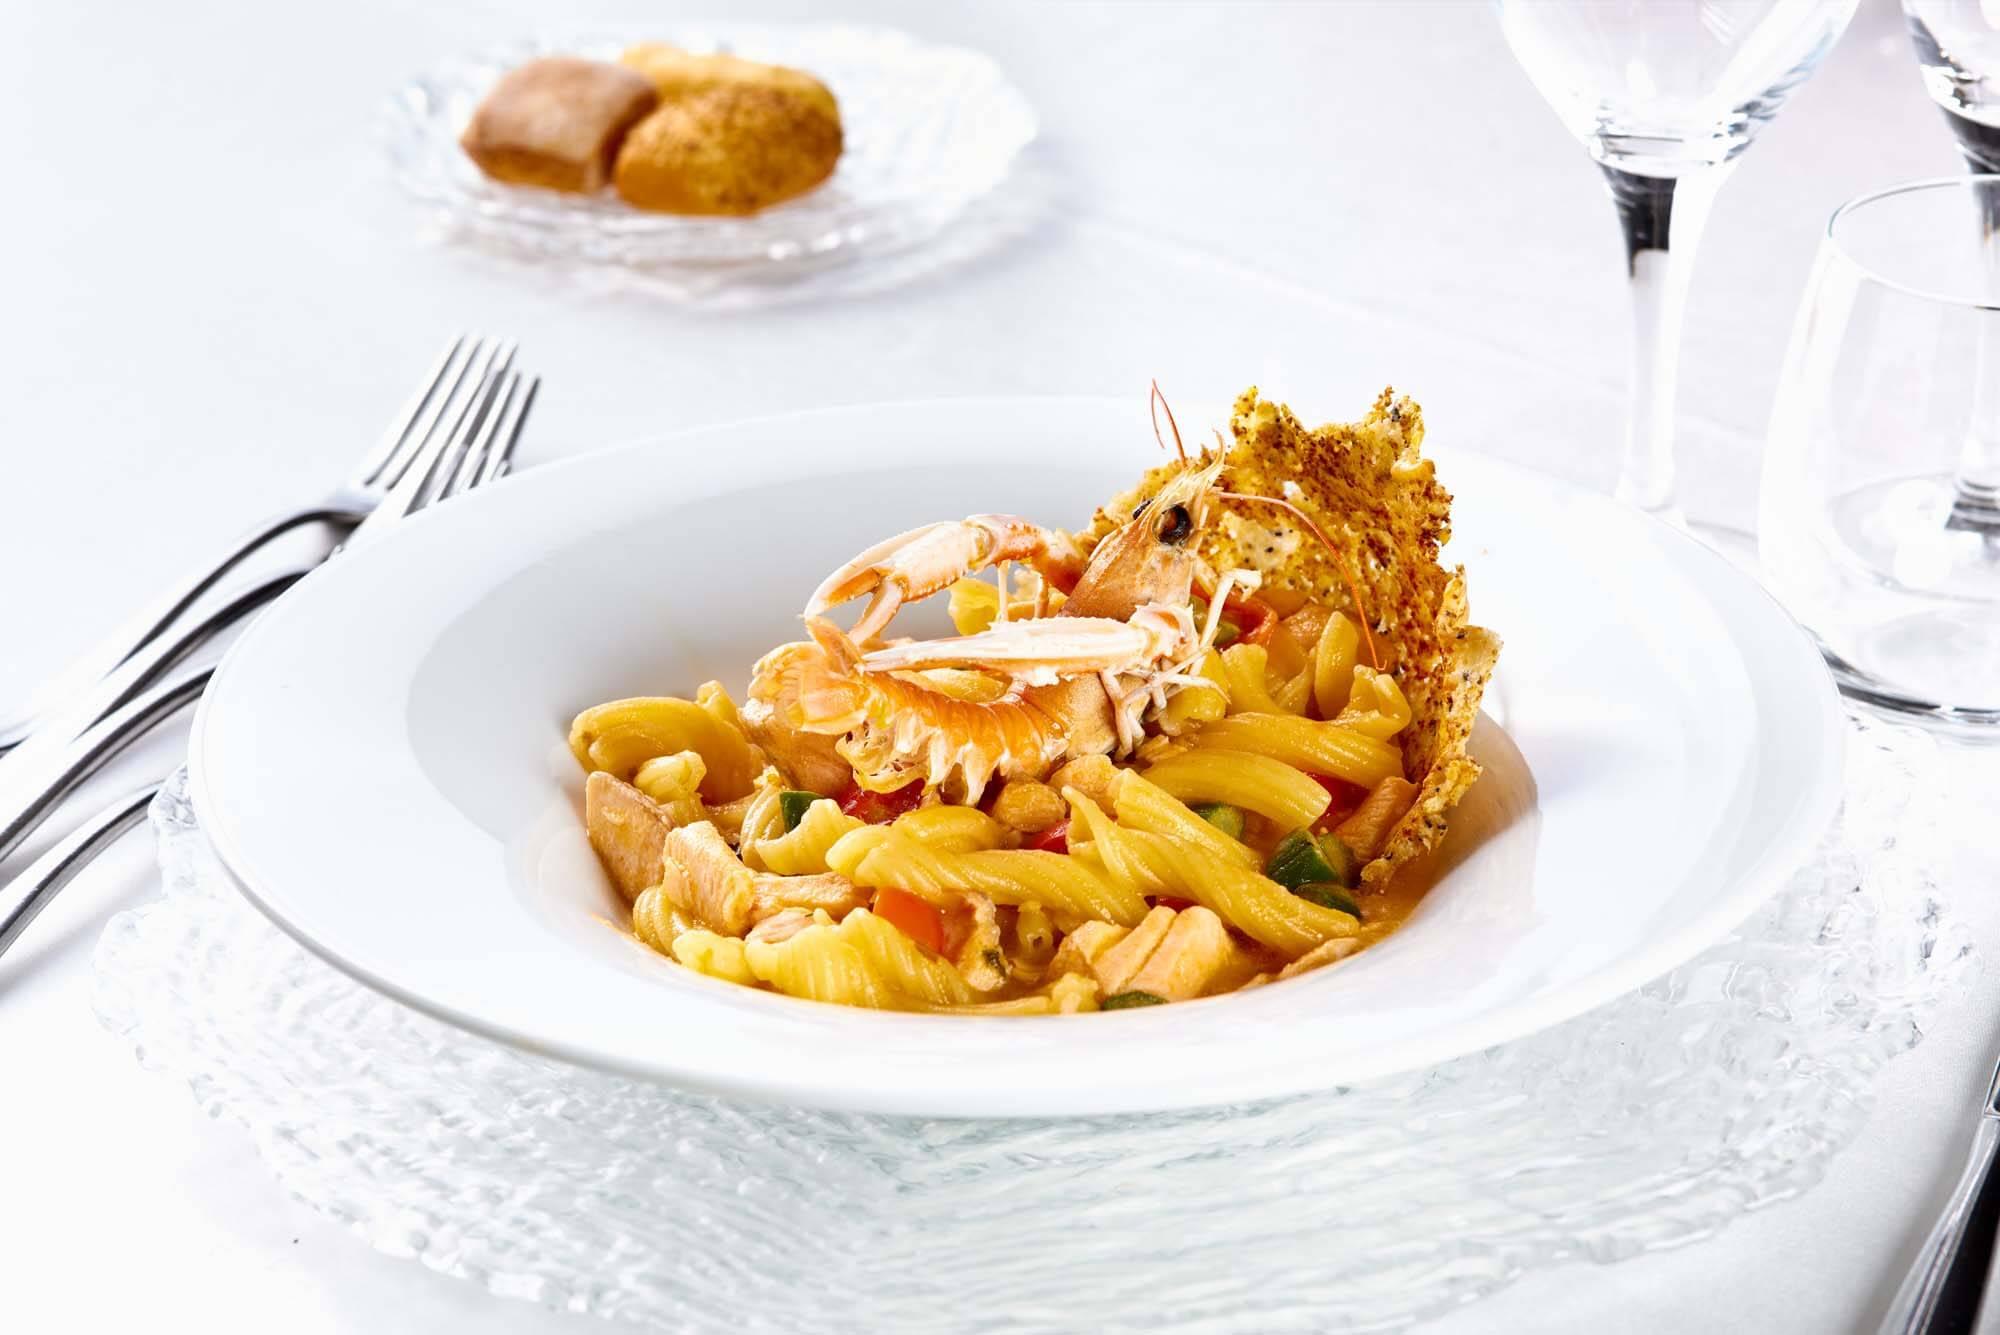 bbadv-photoshooting-food-villa-fabiana-28